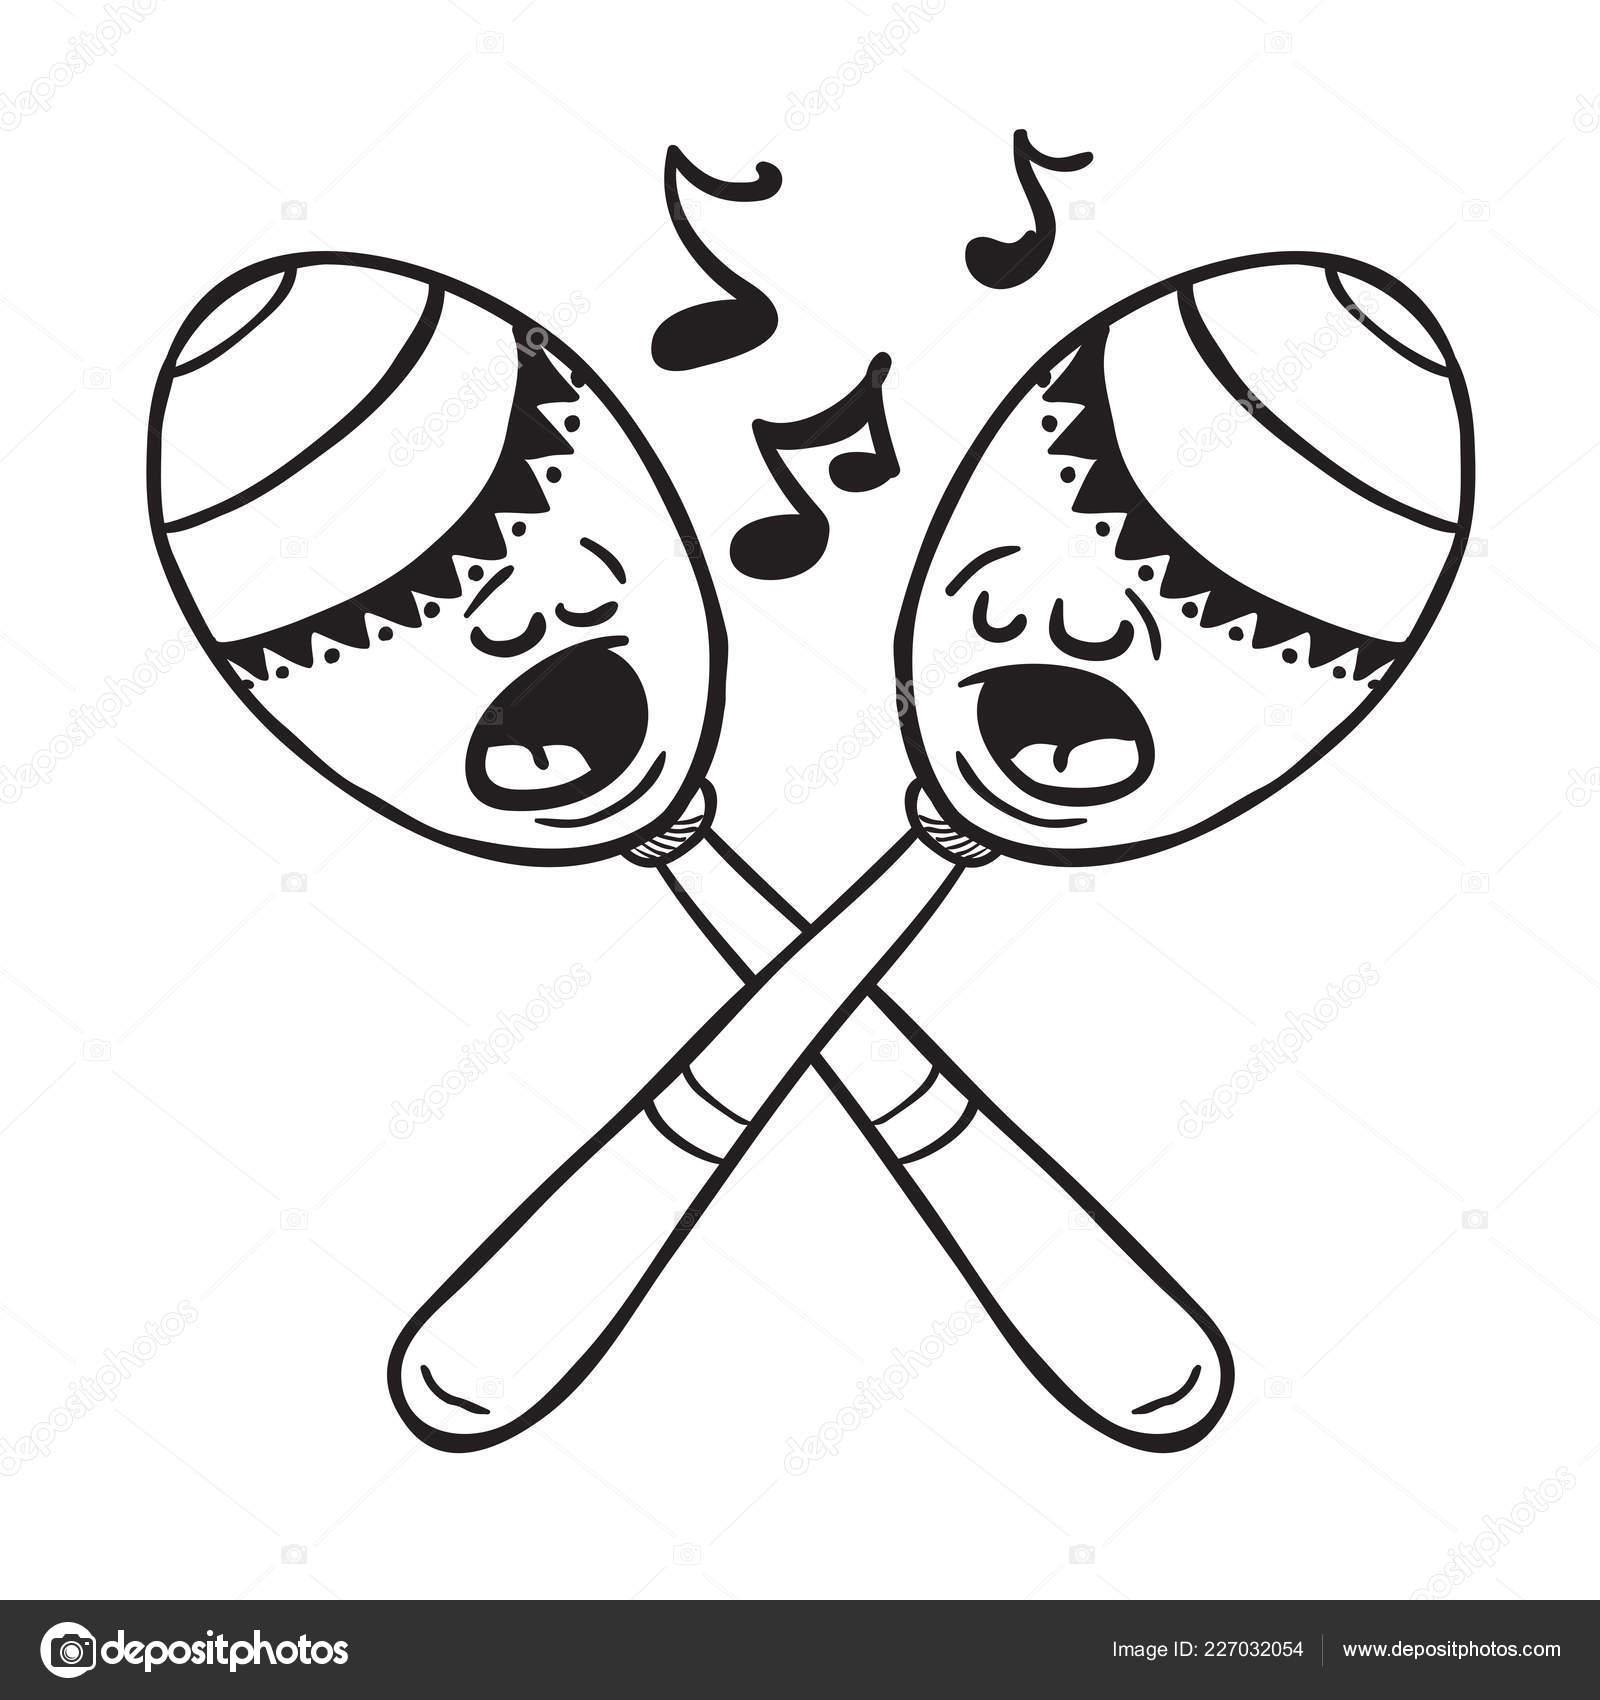 Blanco Negro Maracas Cantando Ilustracion Dibujos Animados